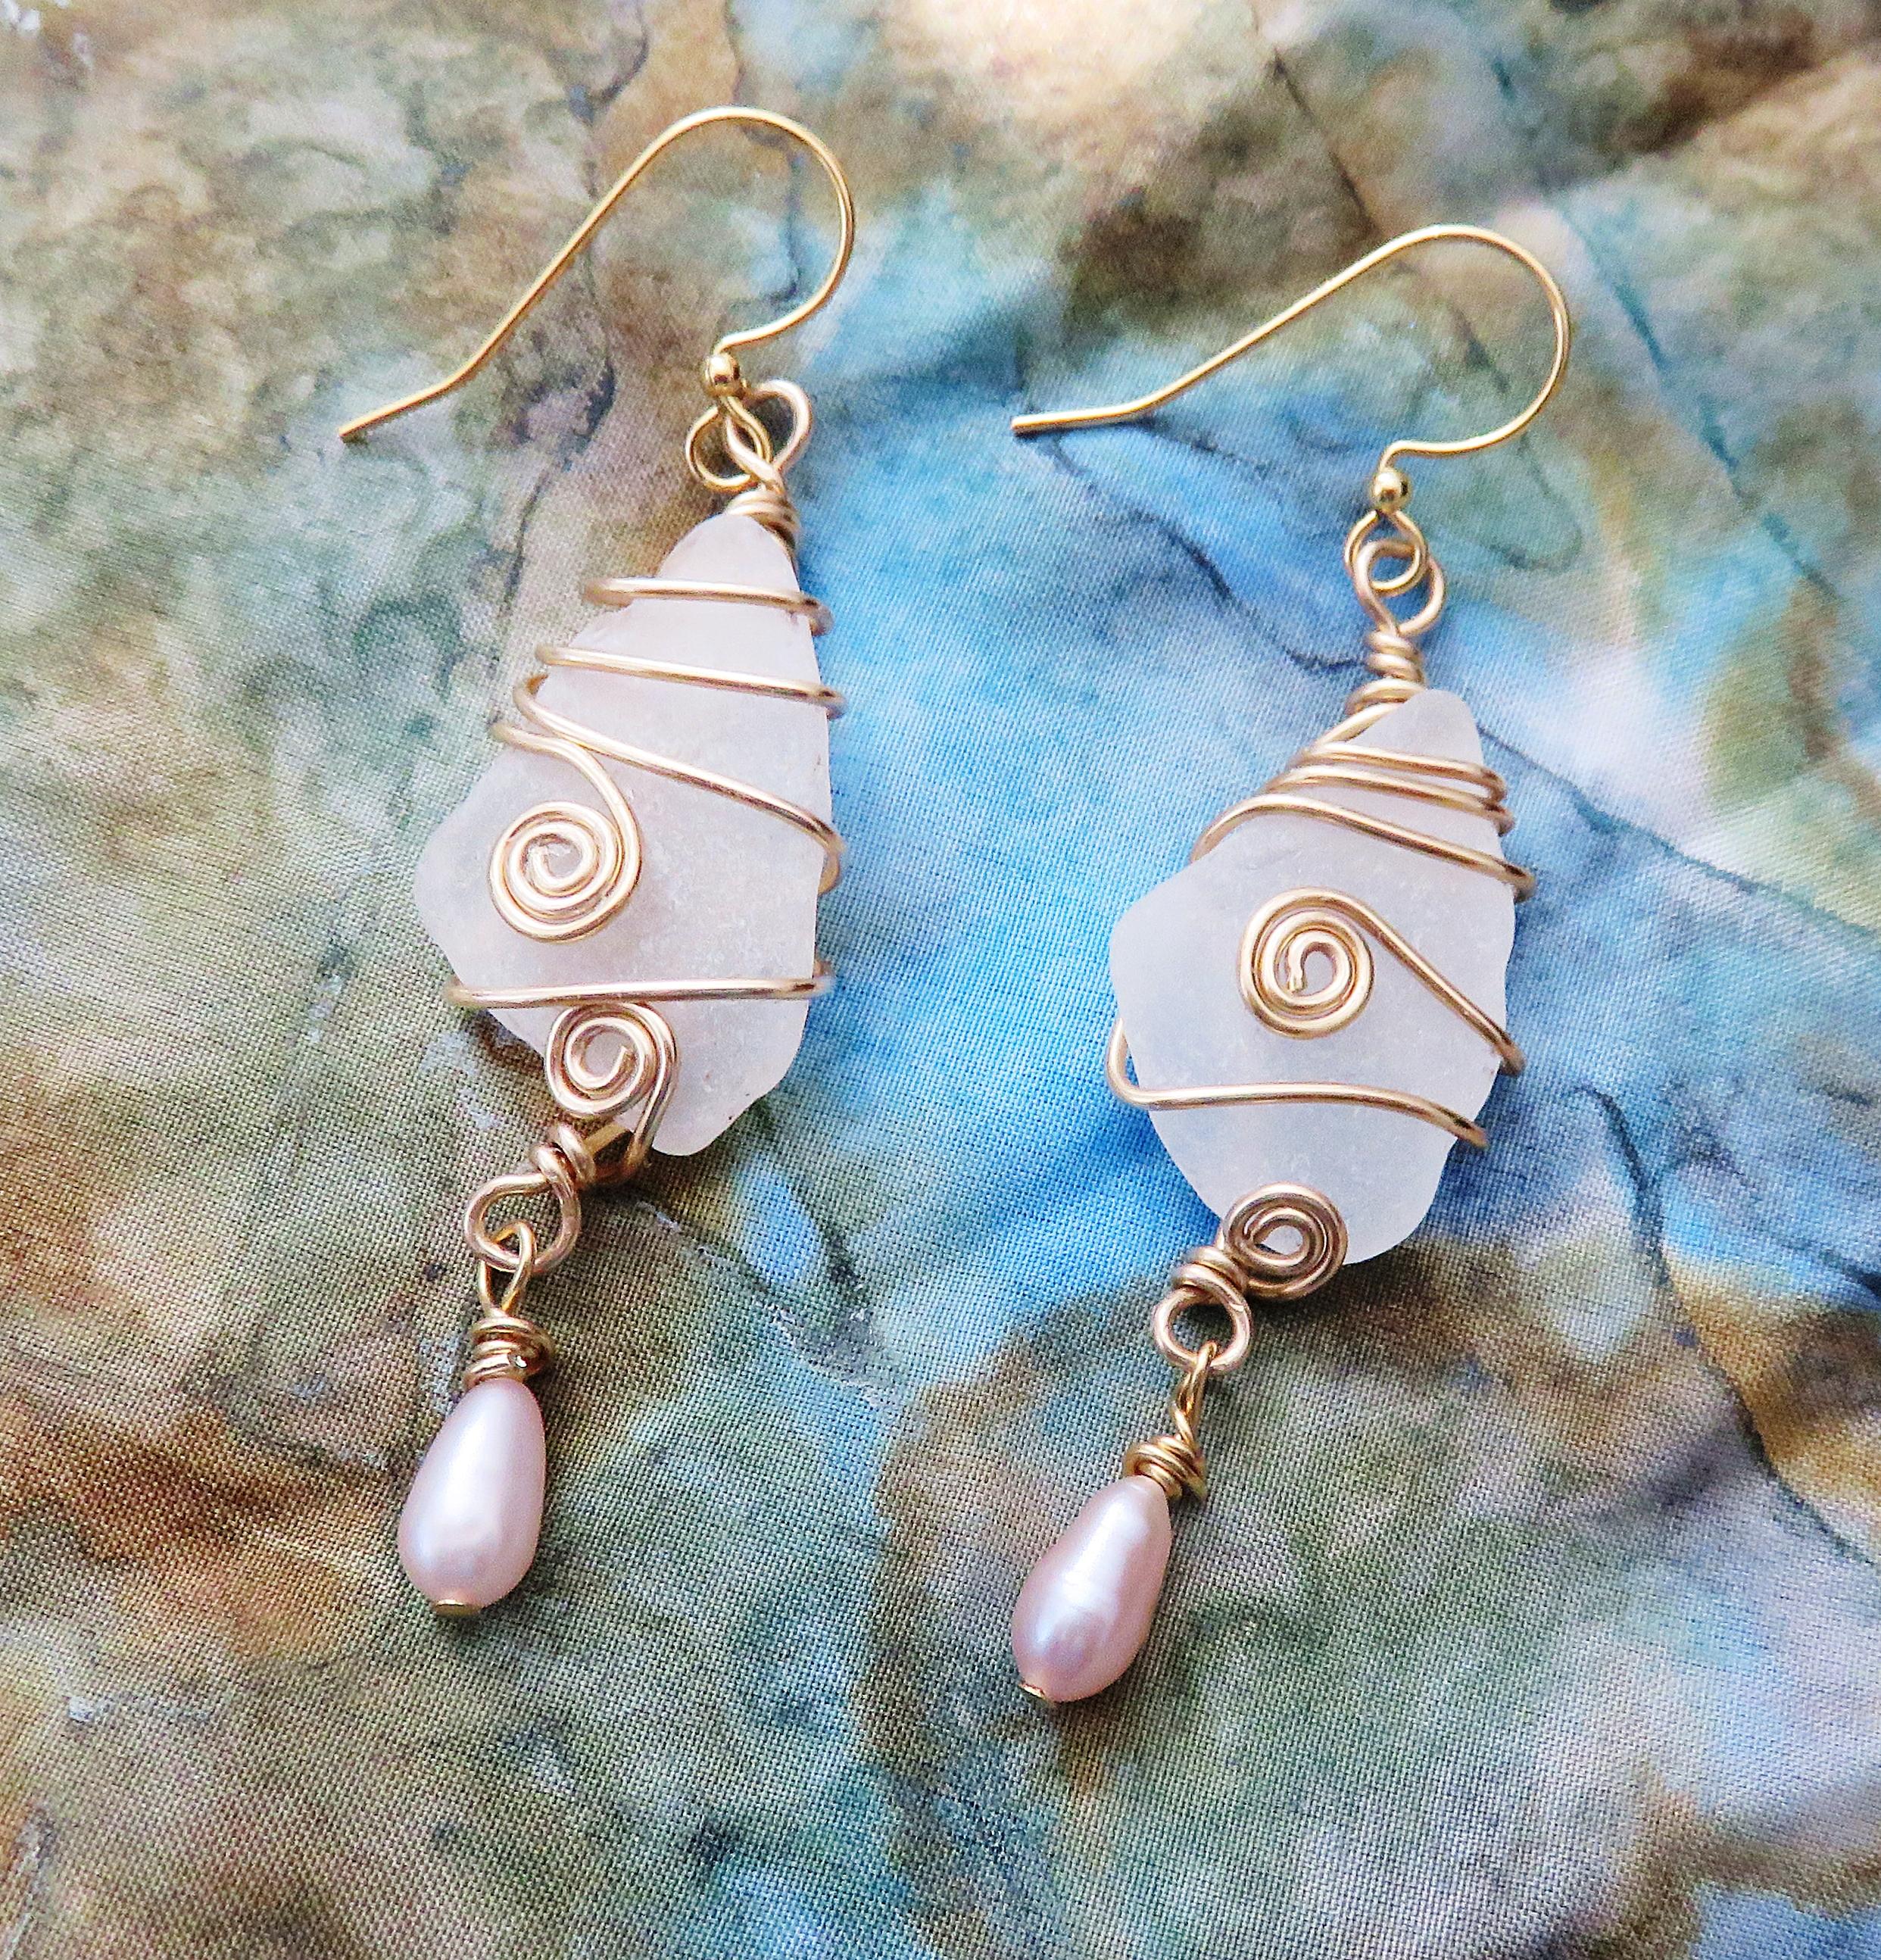 Golden coil seaglass earrings